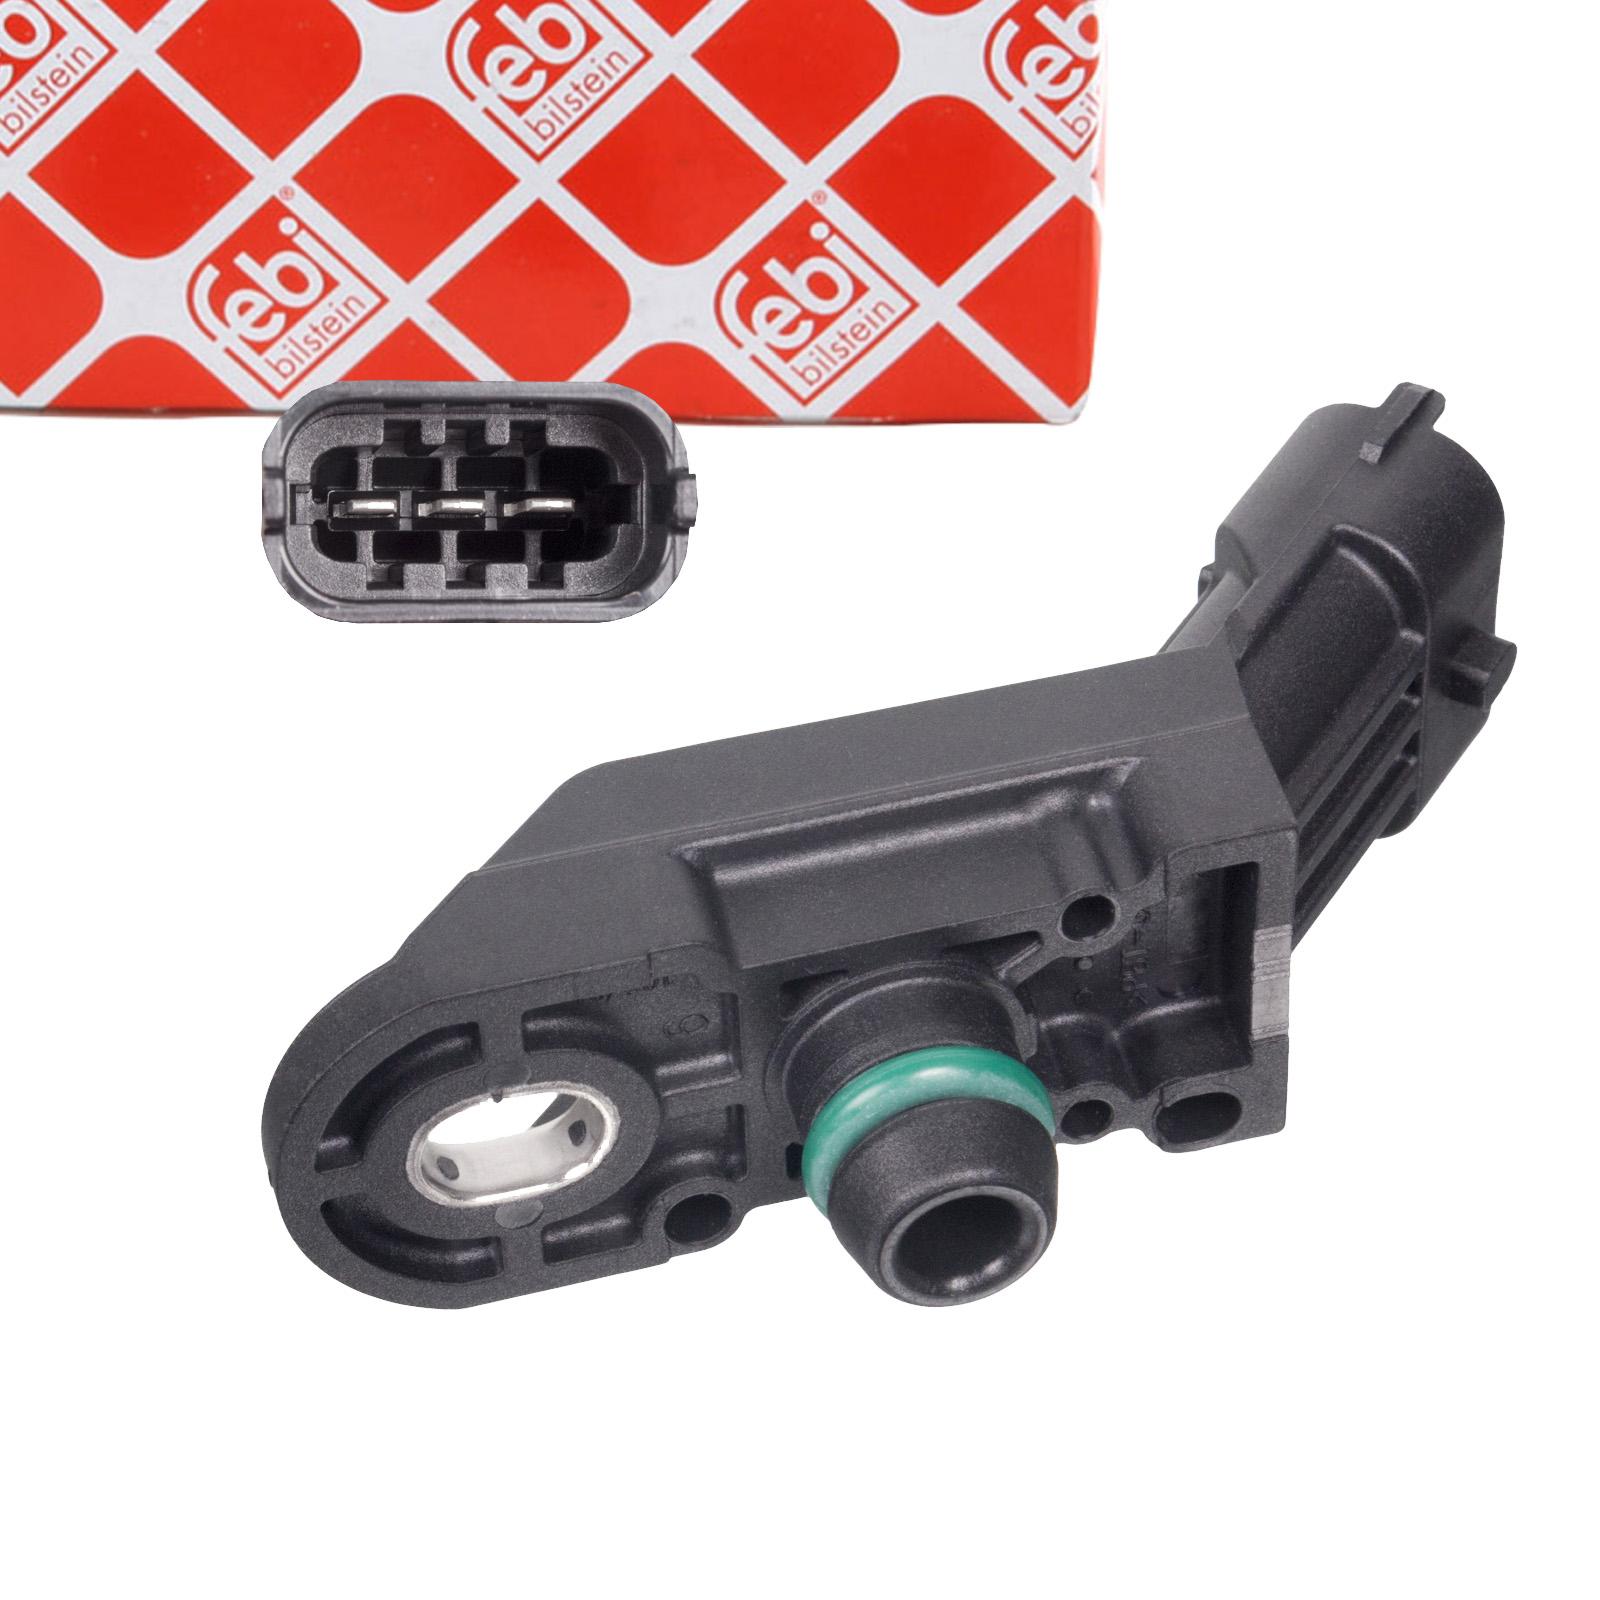 FEBI 102325 Saugrohrdrucksensor OPEL Corsa C D RENAULT Espace 3 4 FIAT Punto 199 Panda 169